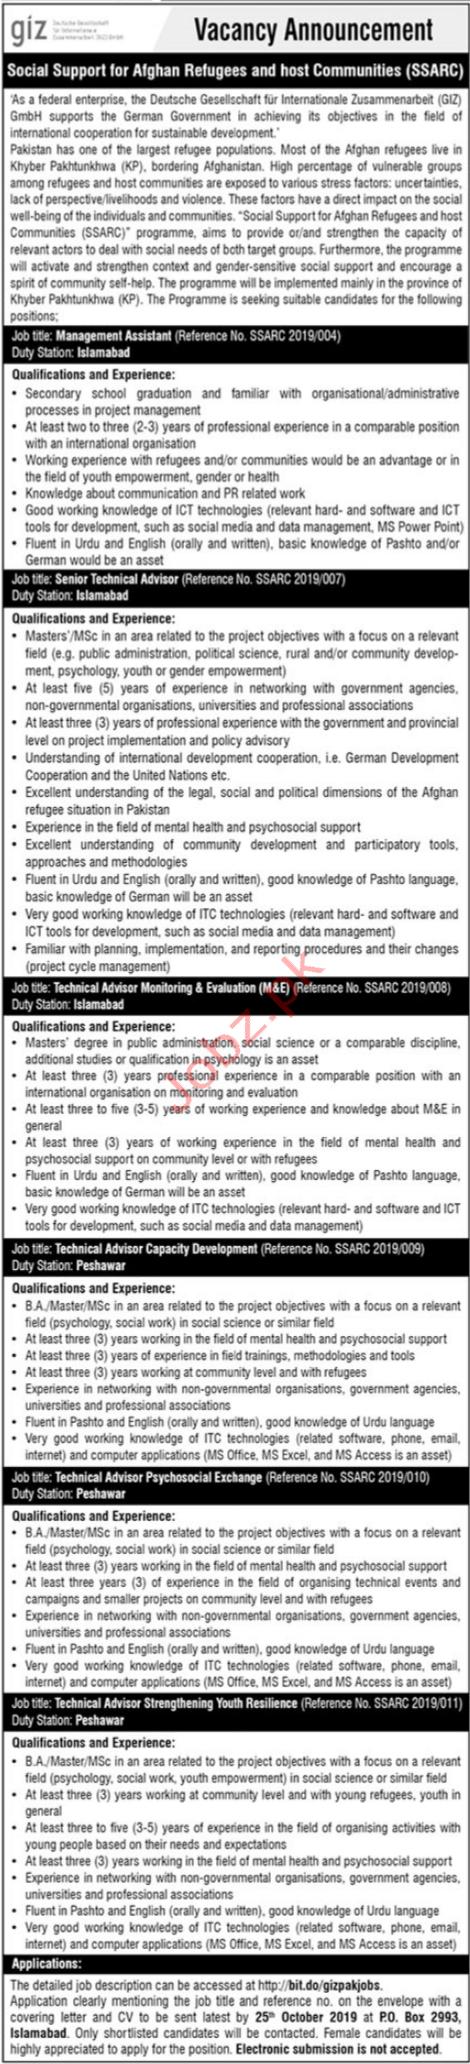 GIZ Pakistan Jobs